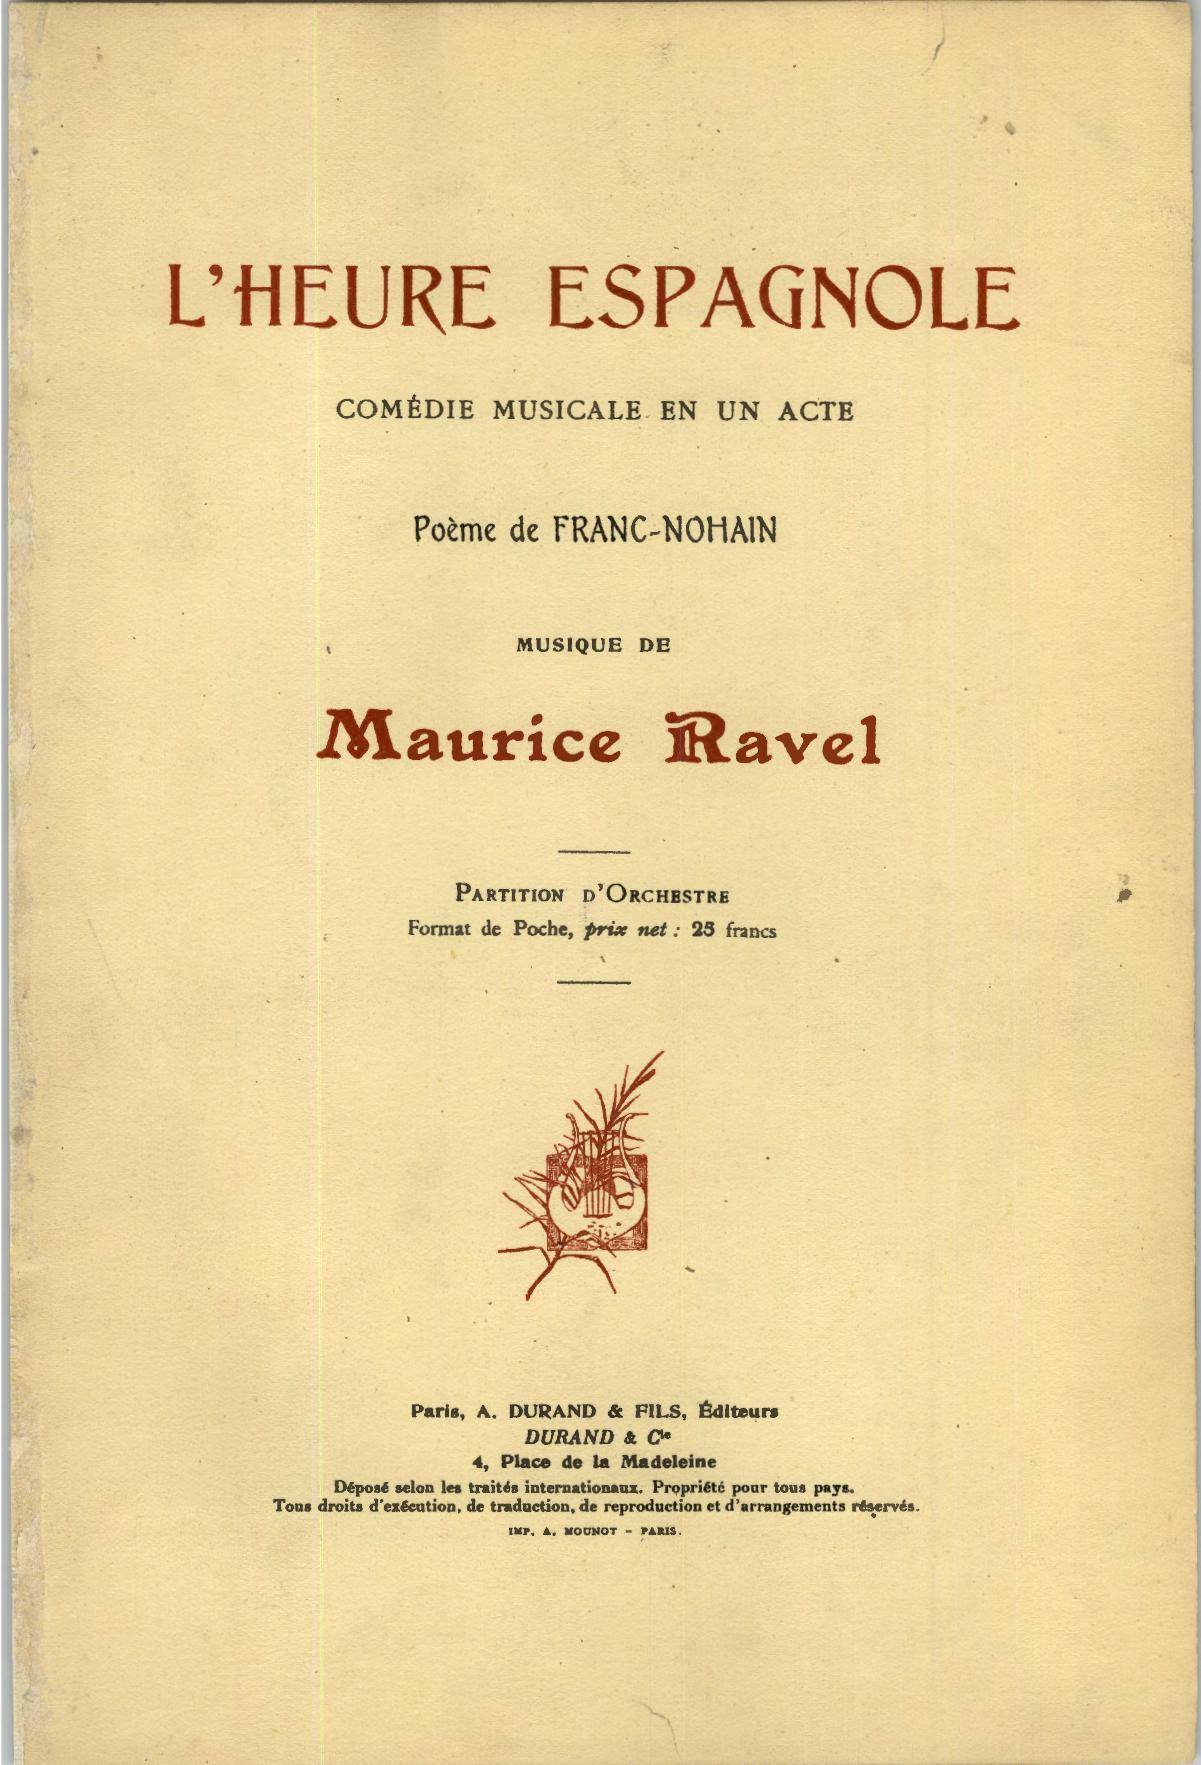 Filelheure Espagnole Color Coverjpg Wikimedia Commons